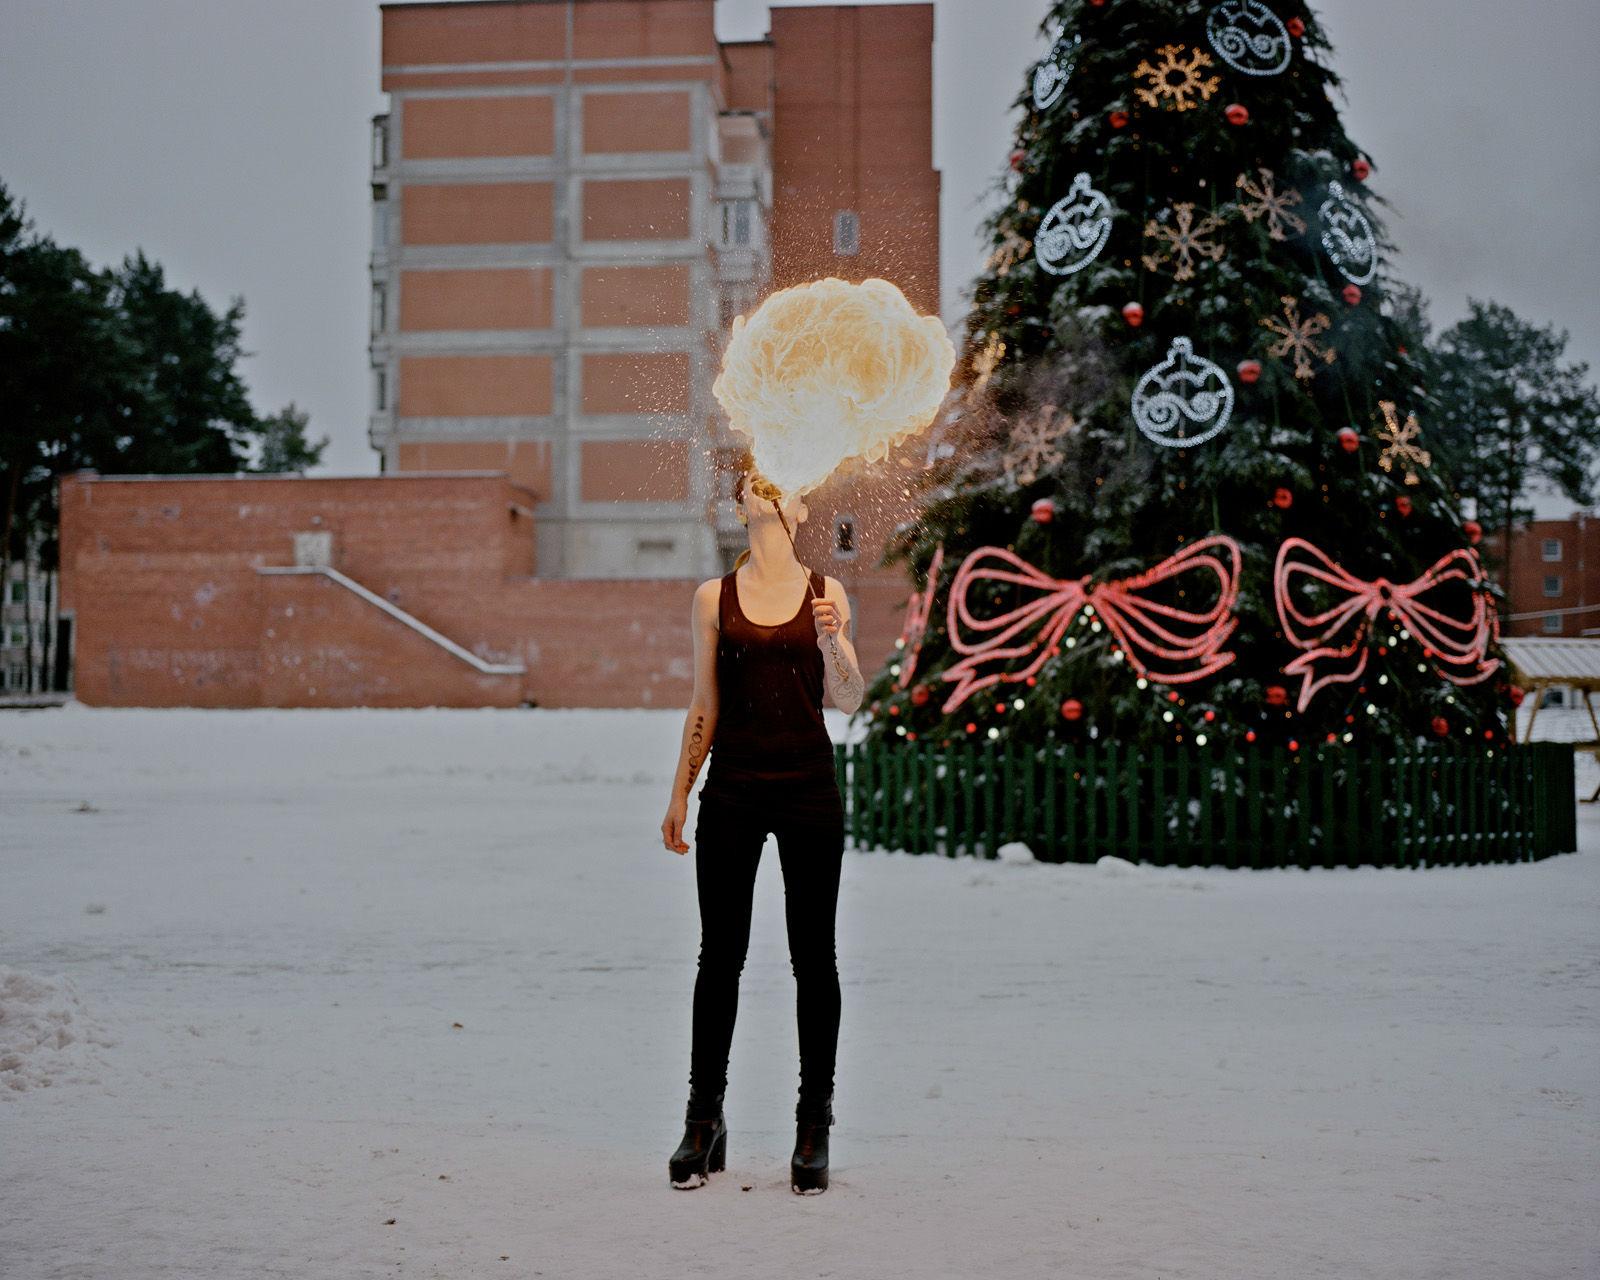 Visaginas_the-suspended_power_Evelyn_Amberthy_Film_Aija_Bley.jpg